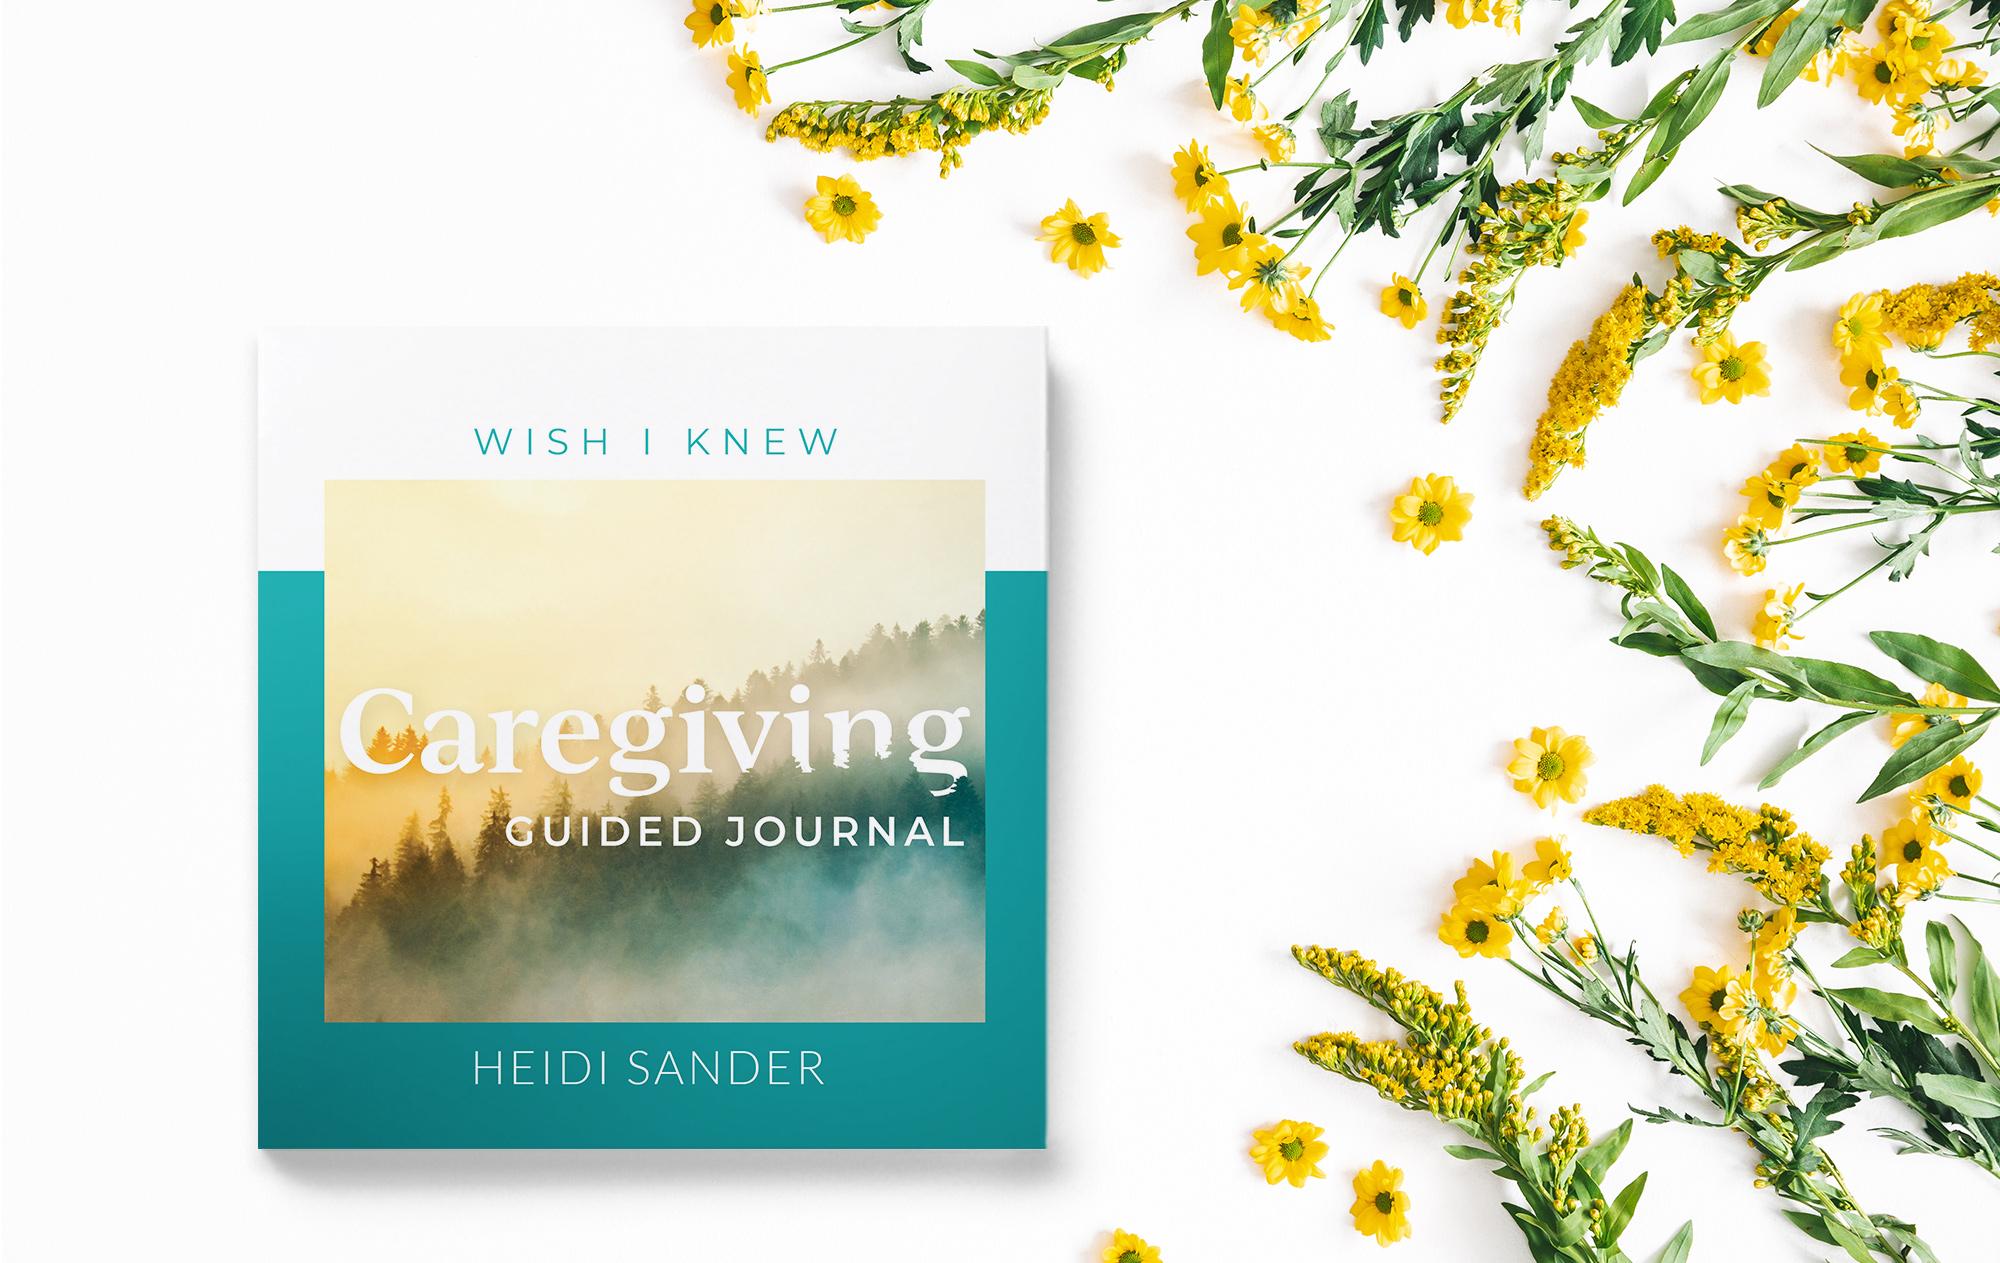 Caregiving Guided Journal